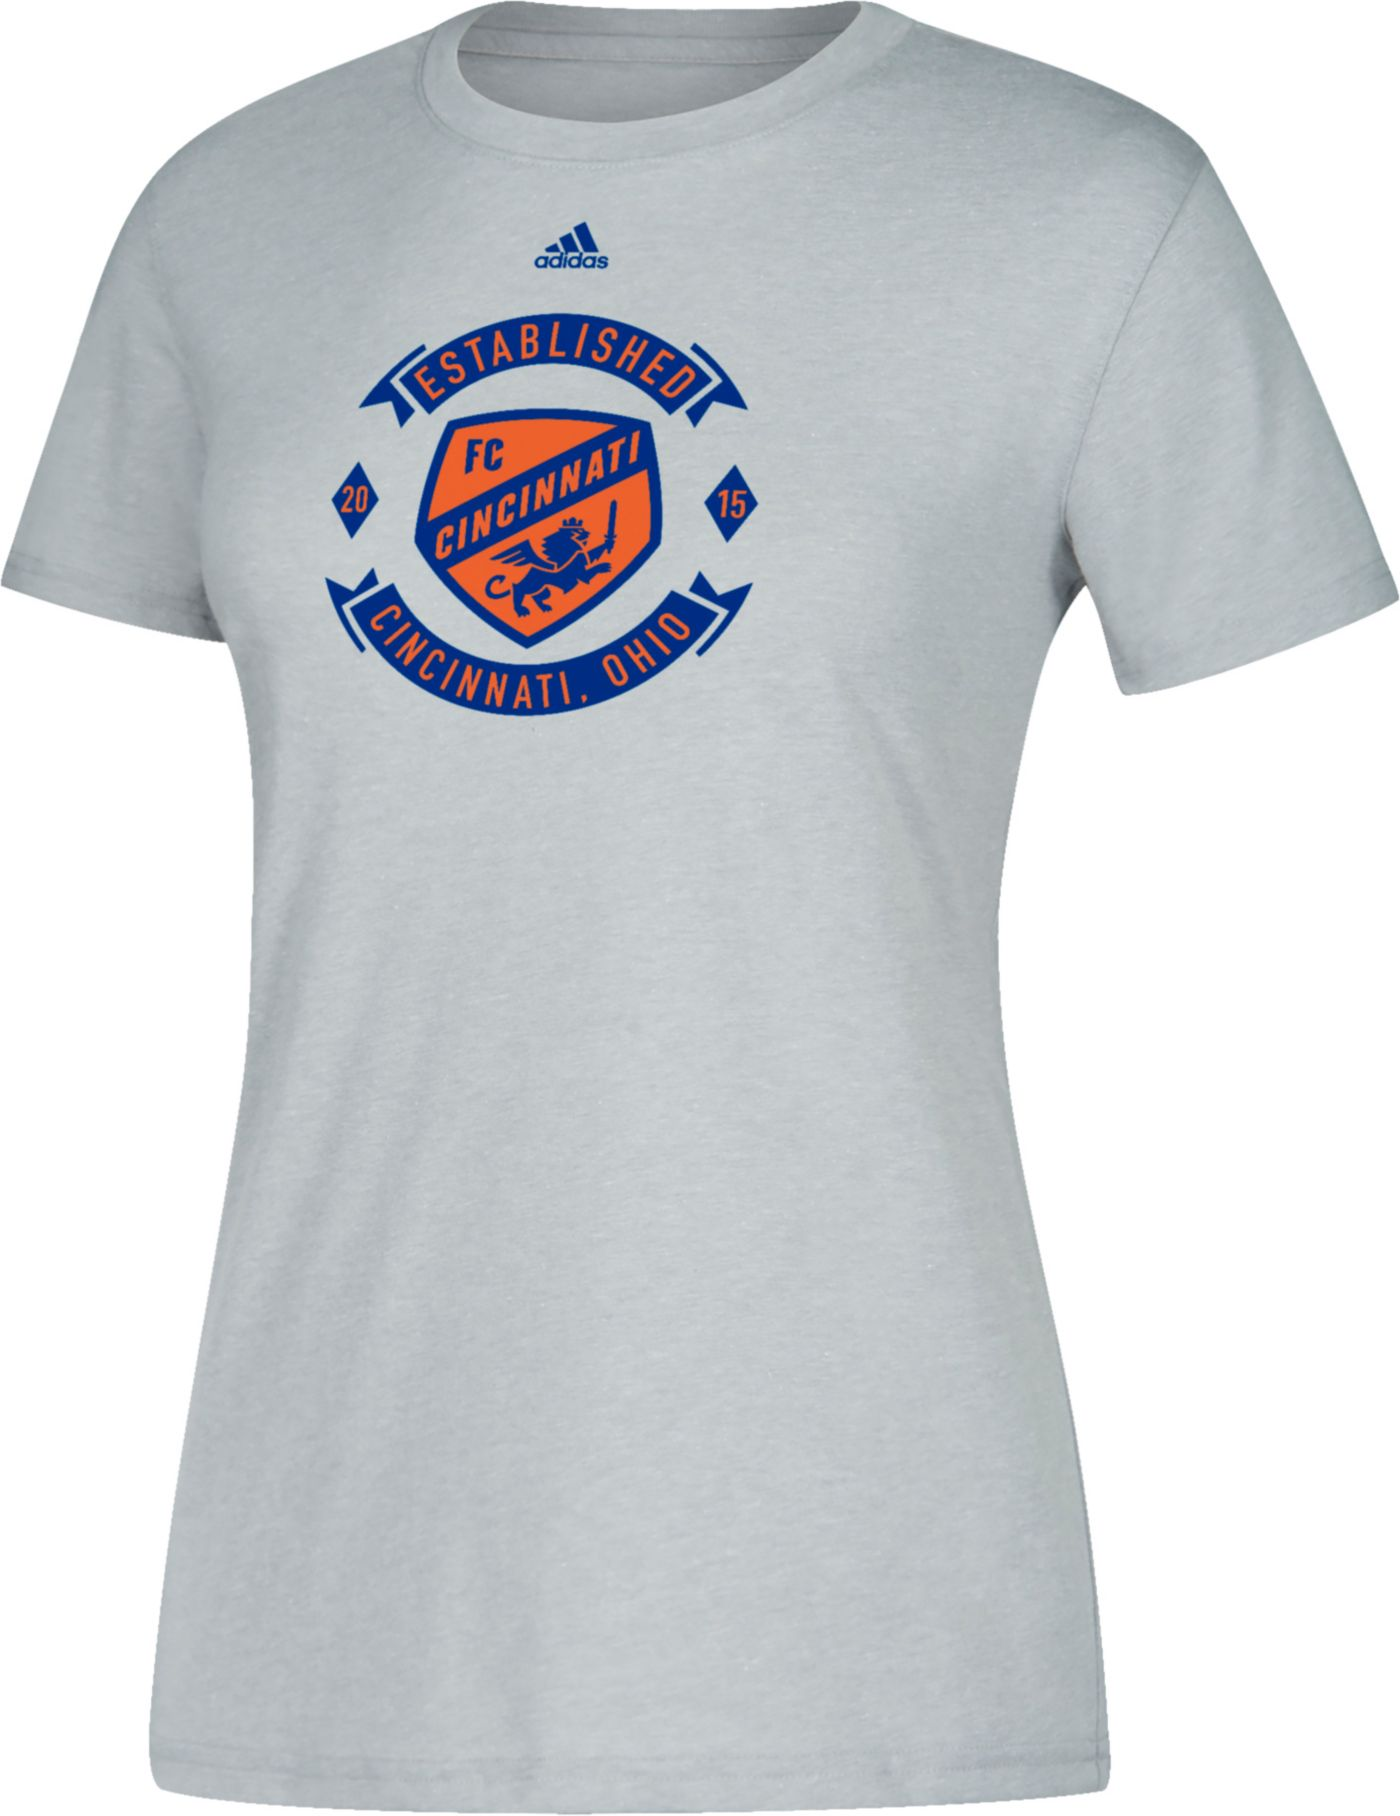 adidas Women's FC Cincinnati Best Crest Heather Grey Performance T-Shirt